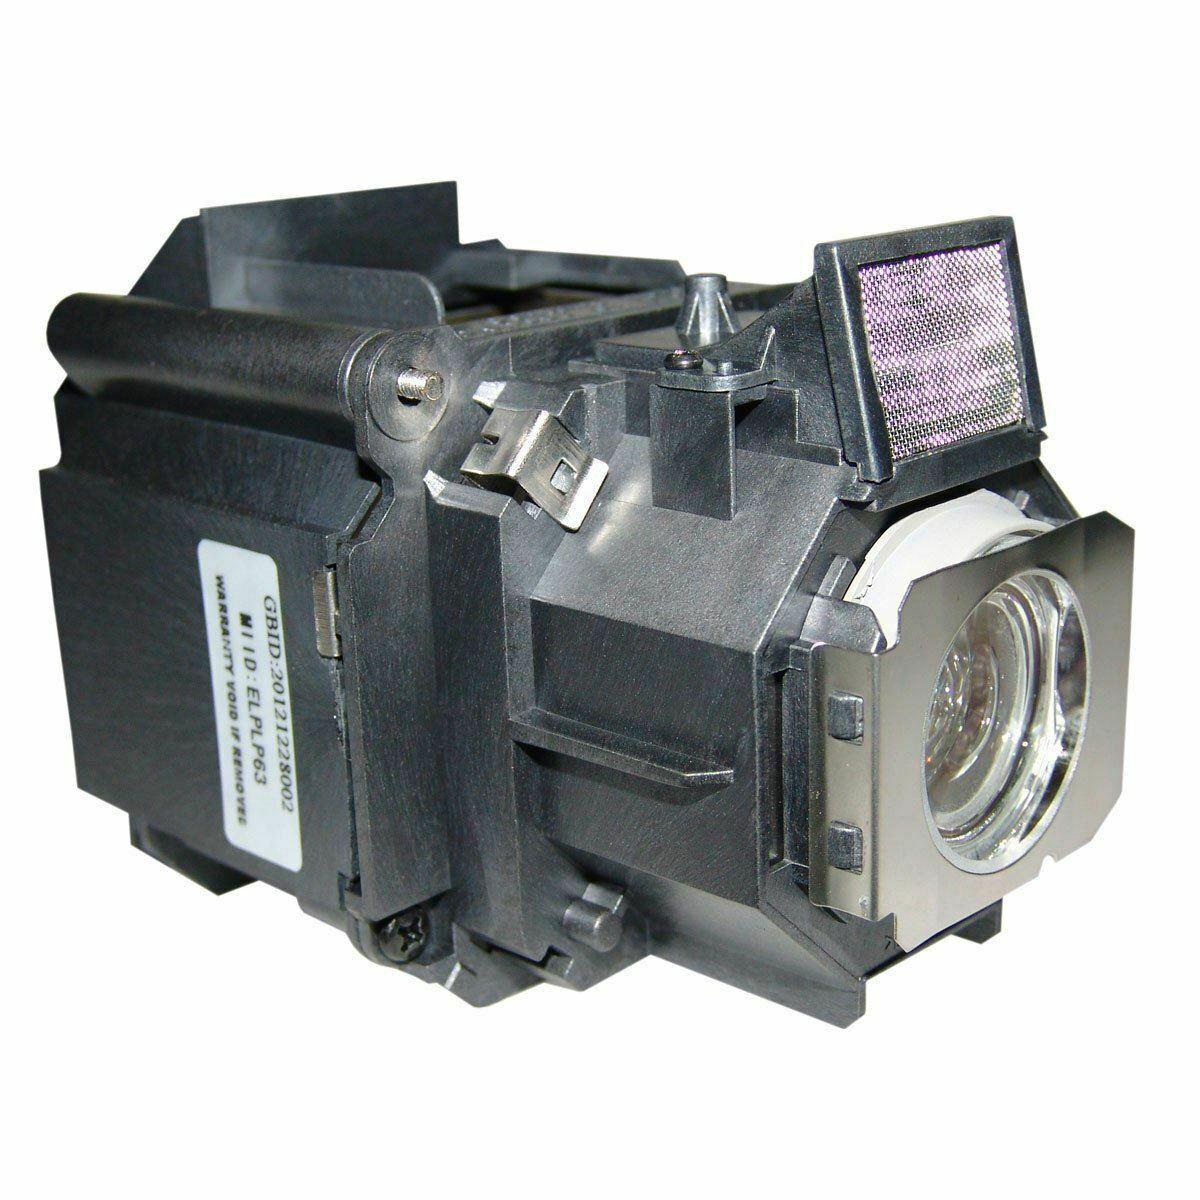 ELPLP63 V13H010L63 لإبسون EB-G5650W ، EB-G5750WU ، EB-G5800 ، EB-G5900 ، EB-G5950 ، PowerLite برو G5650WNL / 4200W العارض مصباح لمبة